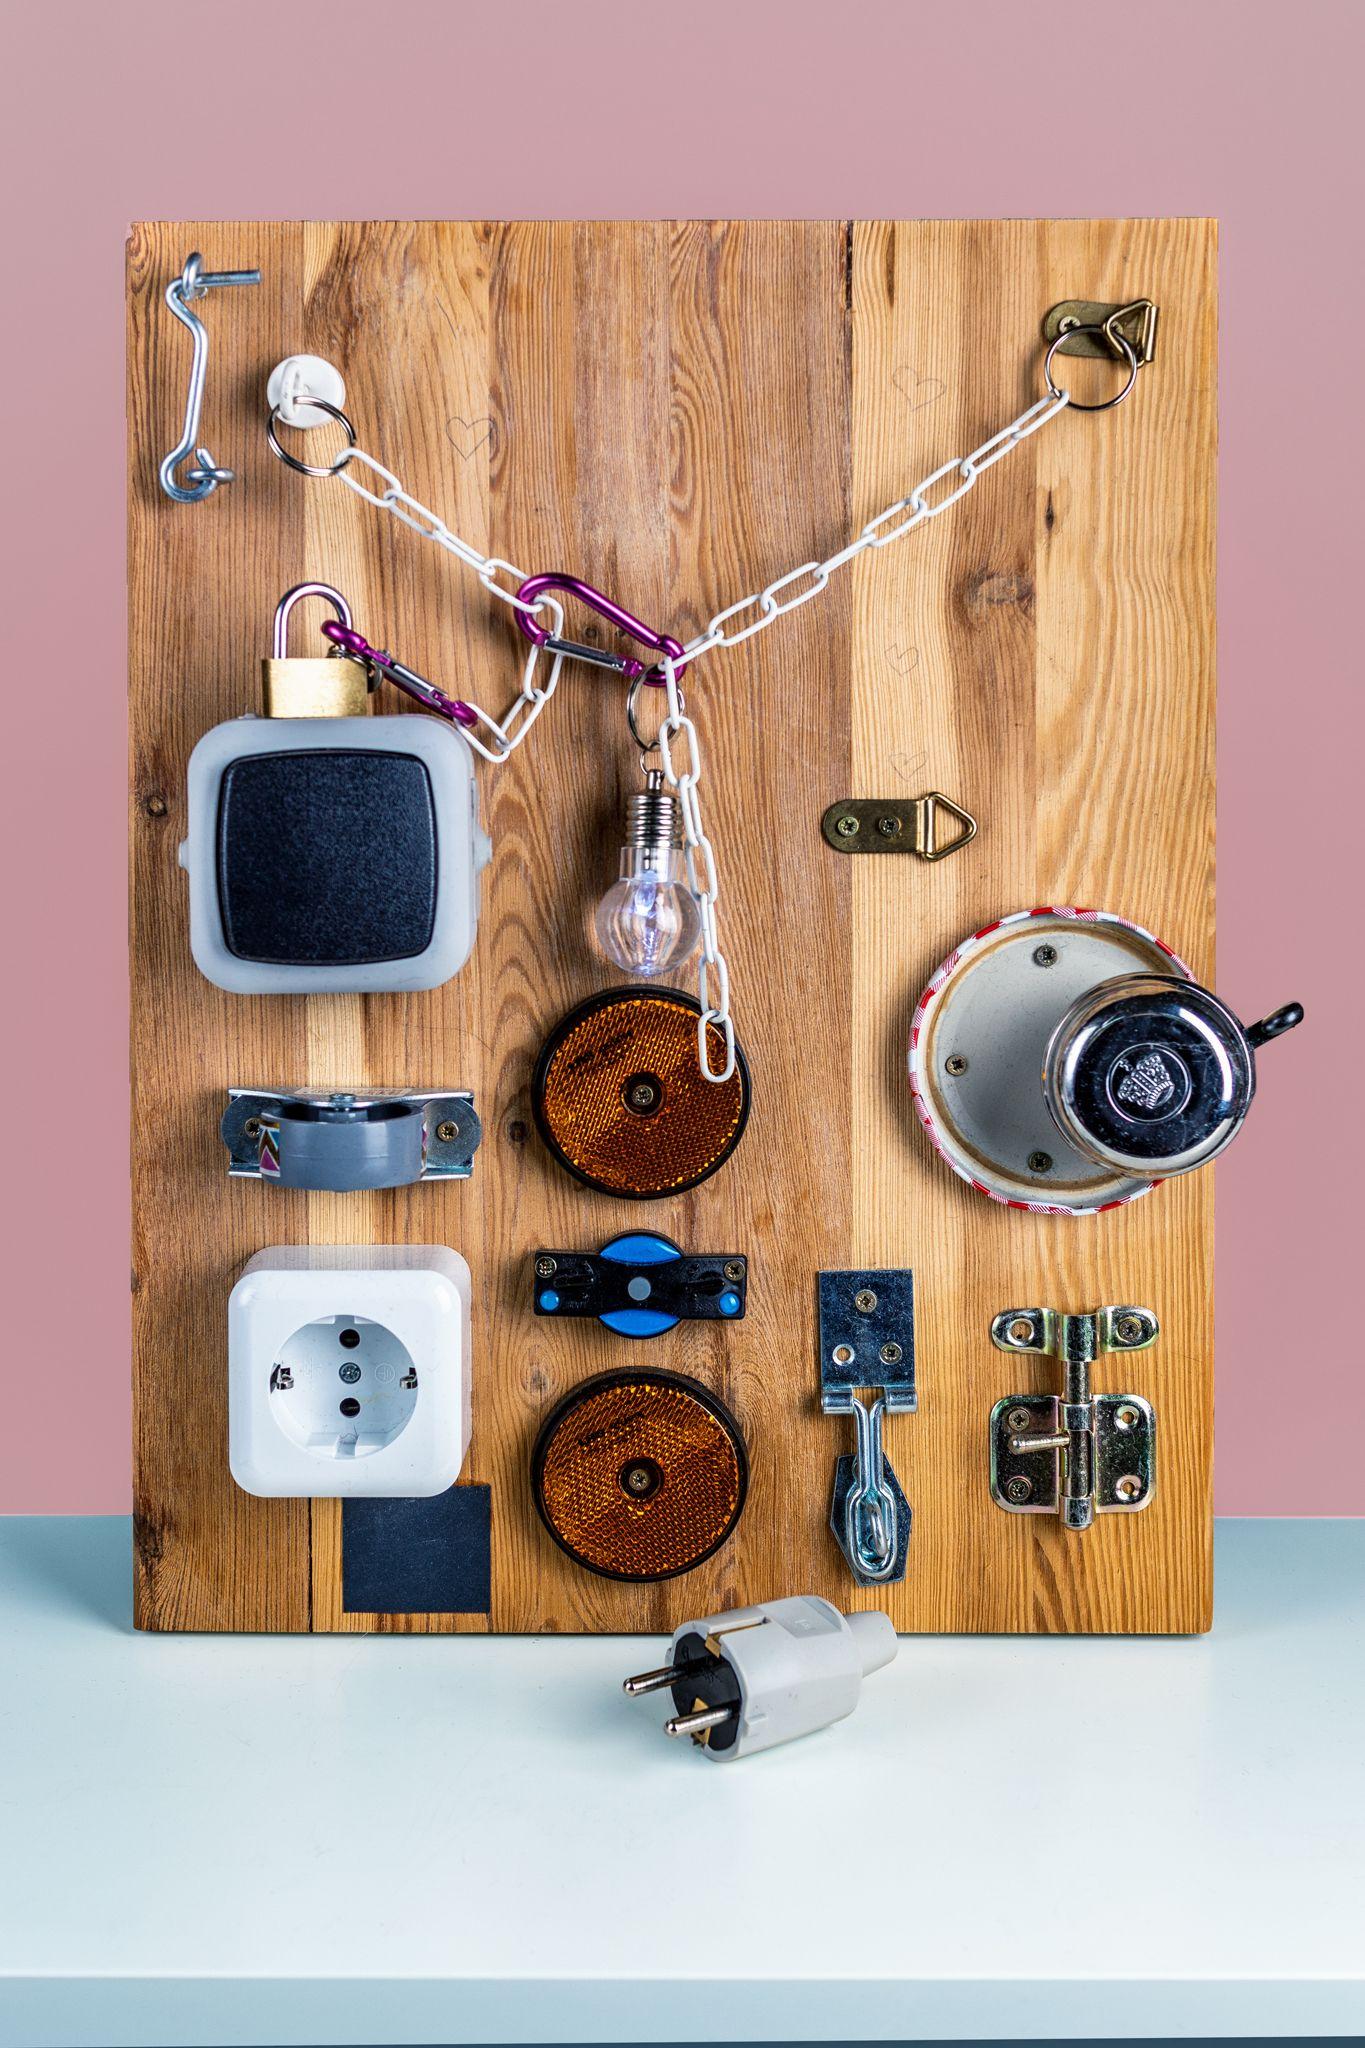 geschenke f r 1 j hrige 10 sinnvolle ideen busyboard. Black Bedroom Furniture Sets. Home Design Ideas